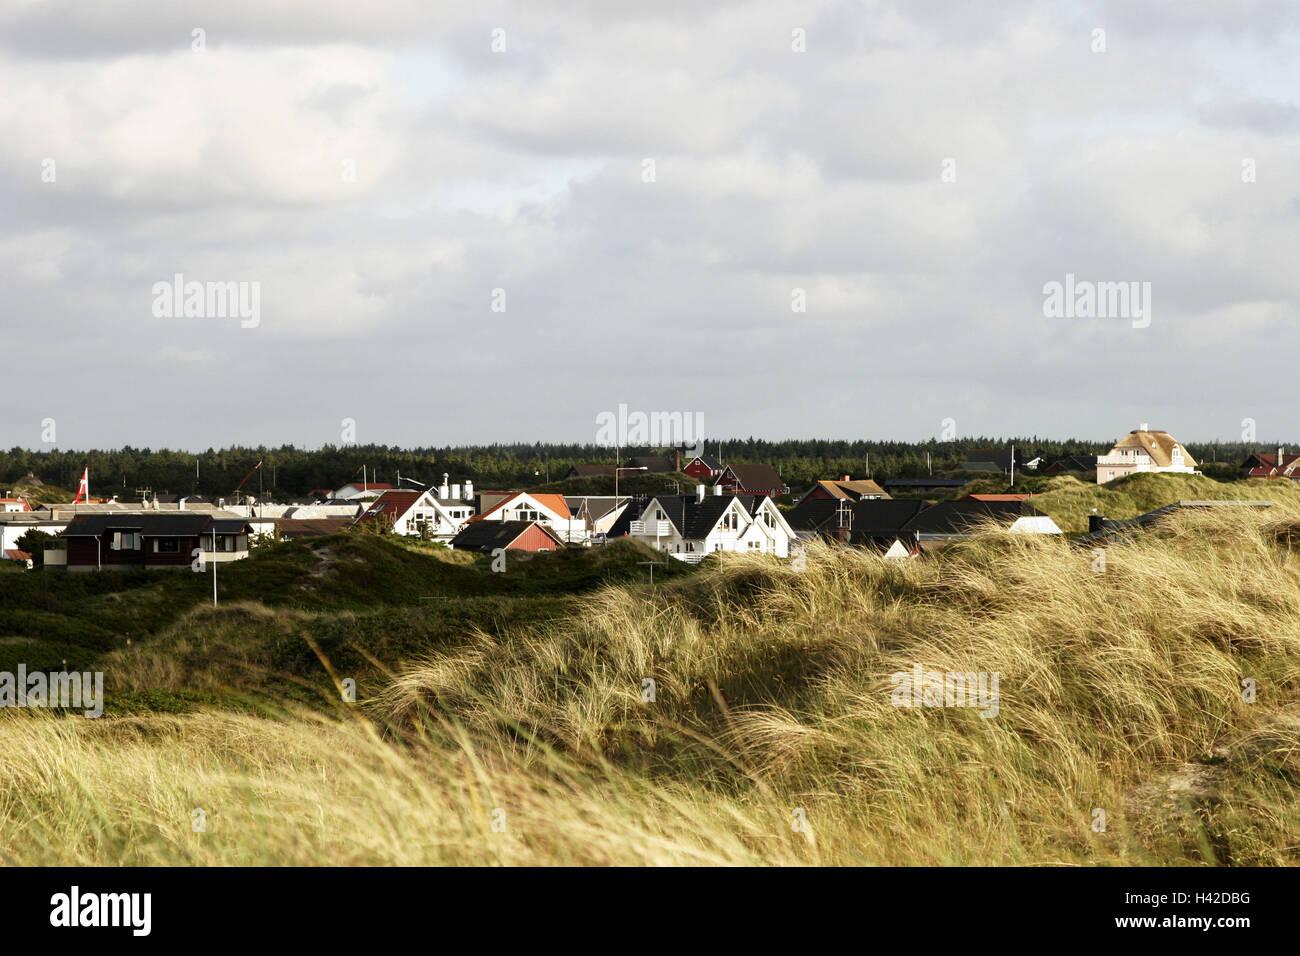 Denmark, Vejers beach, place-opinion, houses, dunes, Scandinavia, place, coast, North sea, dune-landscape, destination, - Stock Image